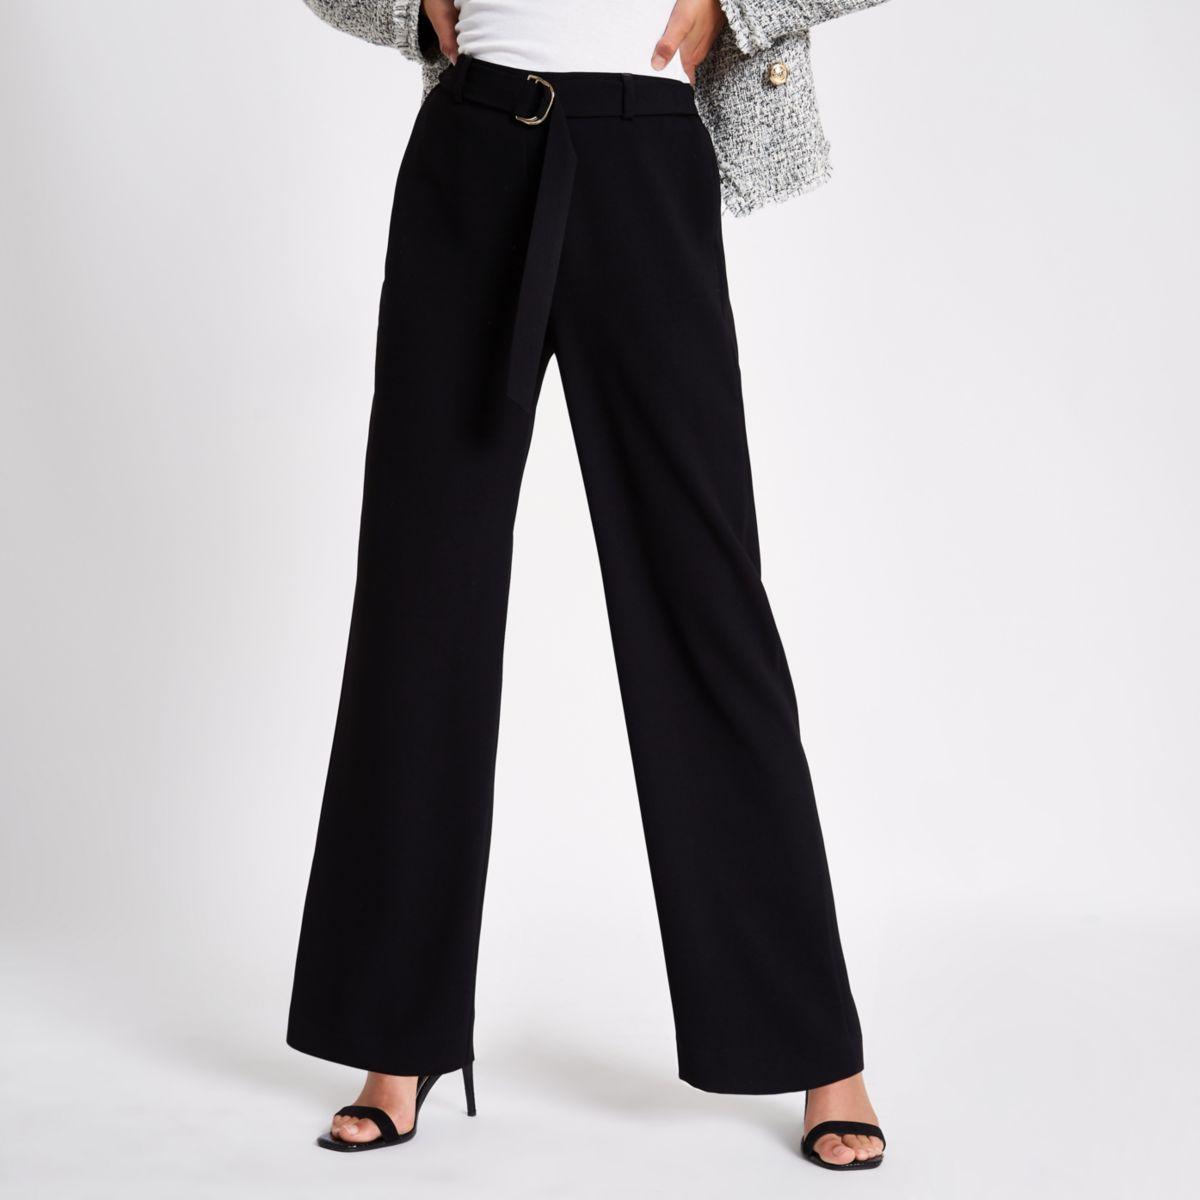 Black slim wide leg belted trousers